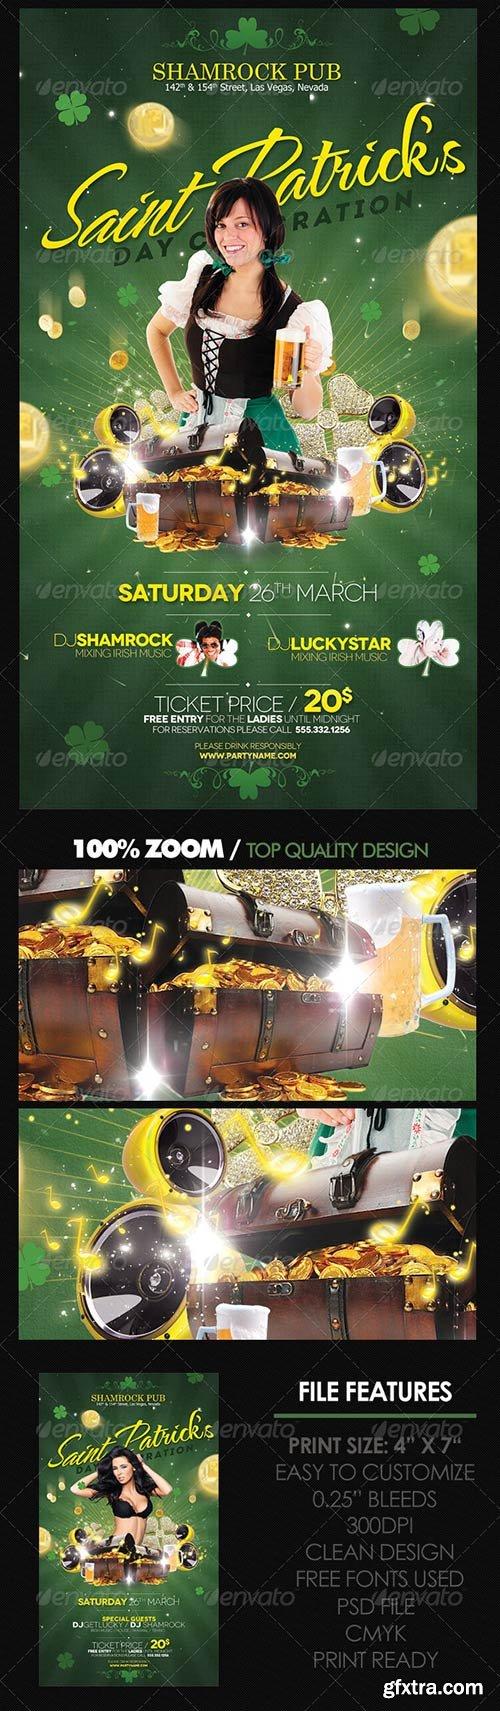 GraphicRiver - St. Patricks Flyer 3951723